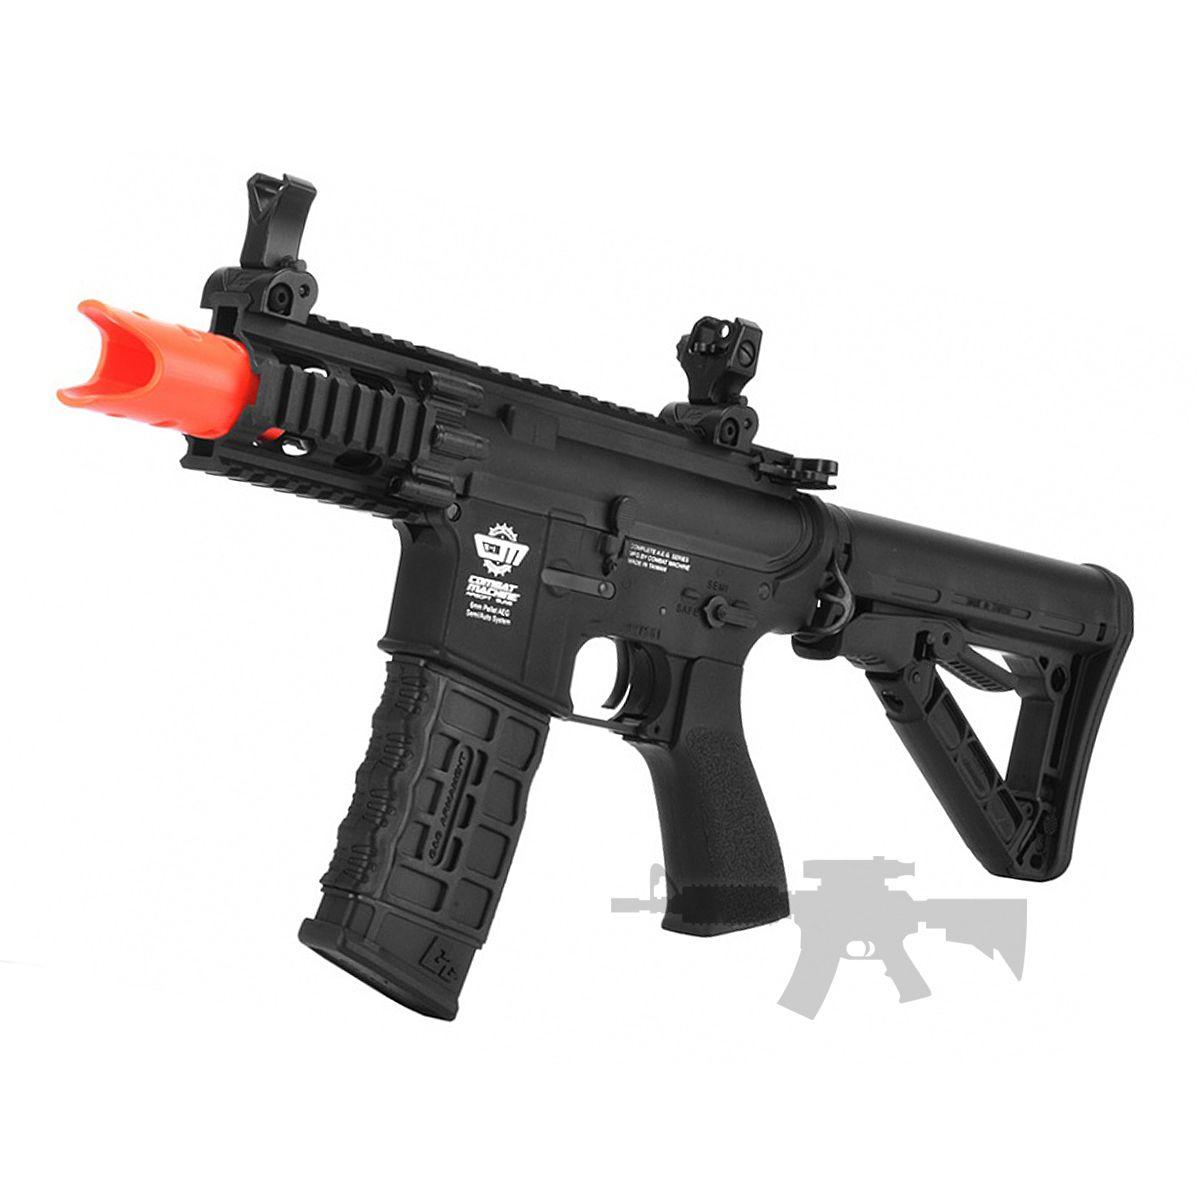 G&G Firehawk Combat Machine AEG Airsoft Guns